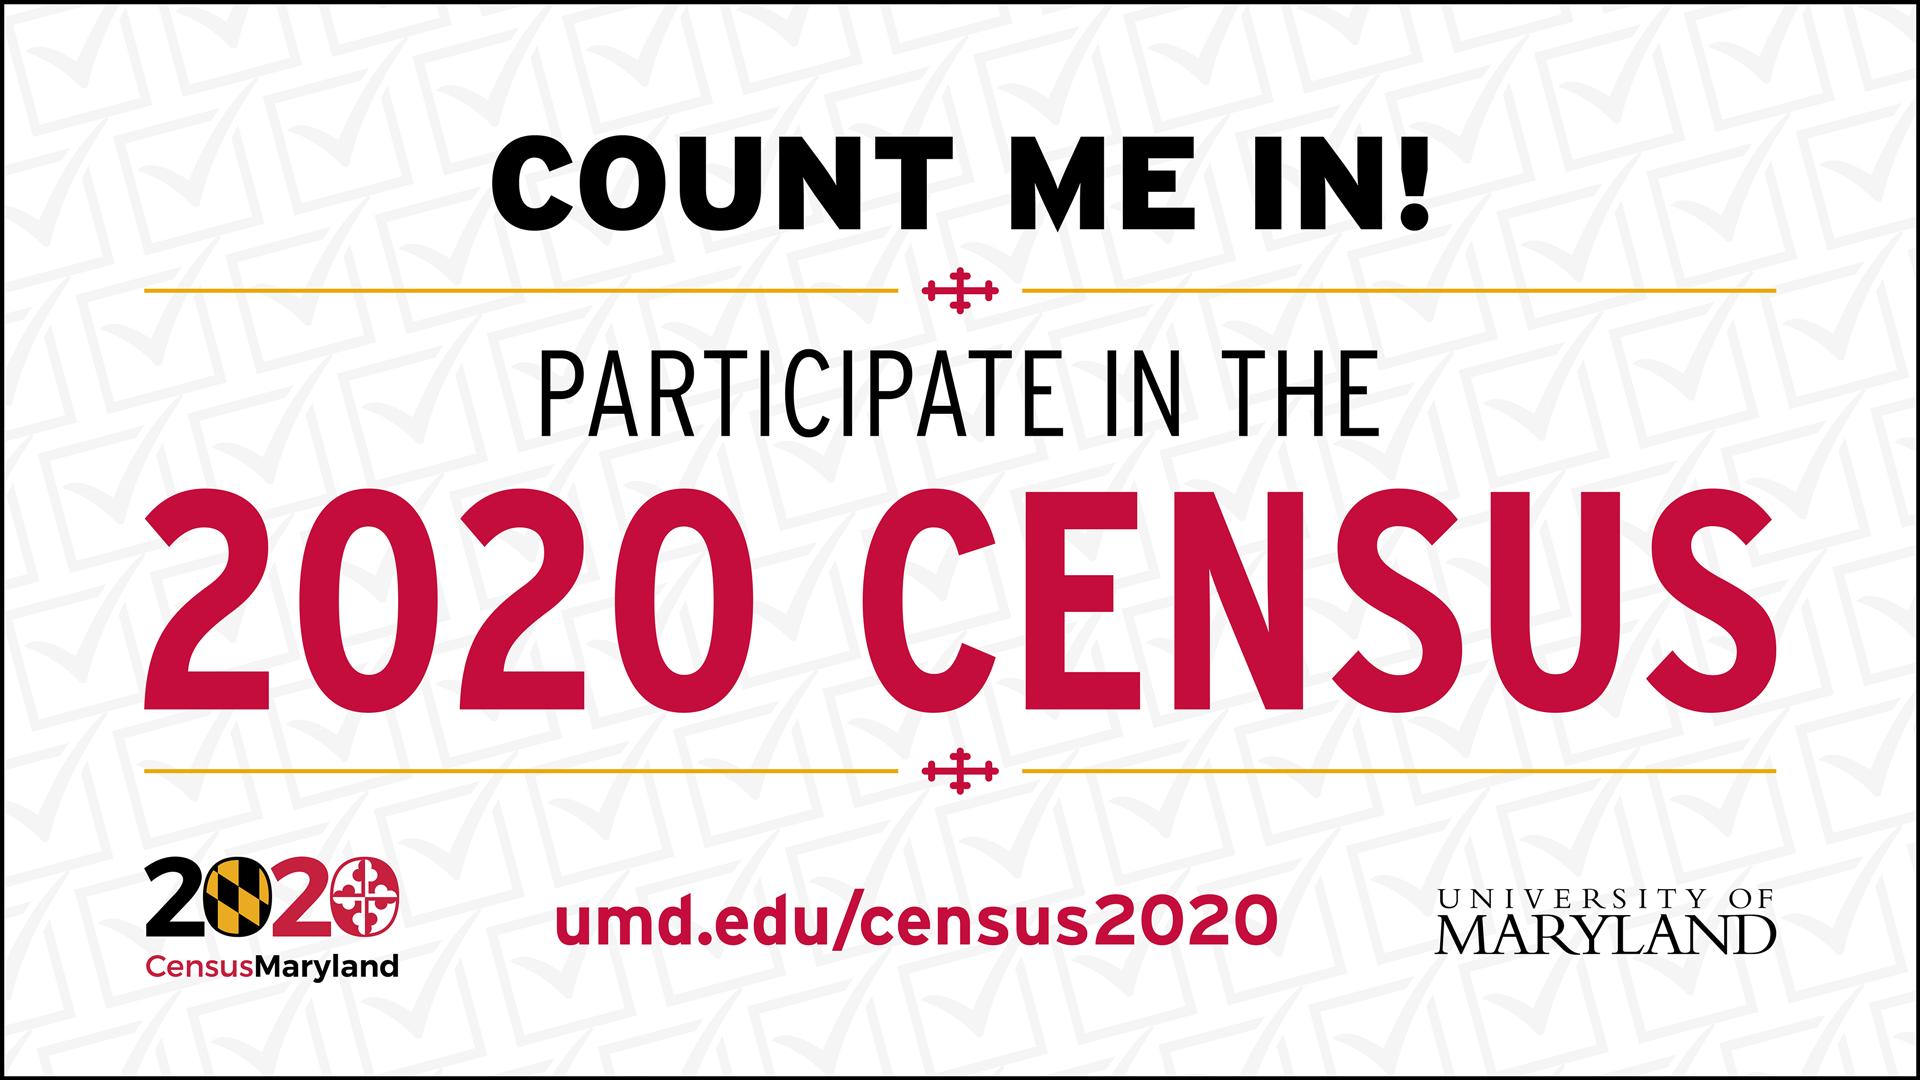 Count Me In! Participate In The 2020 Census